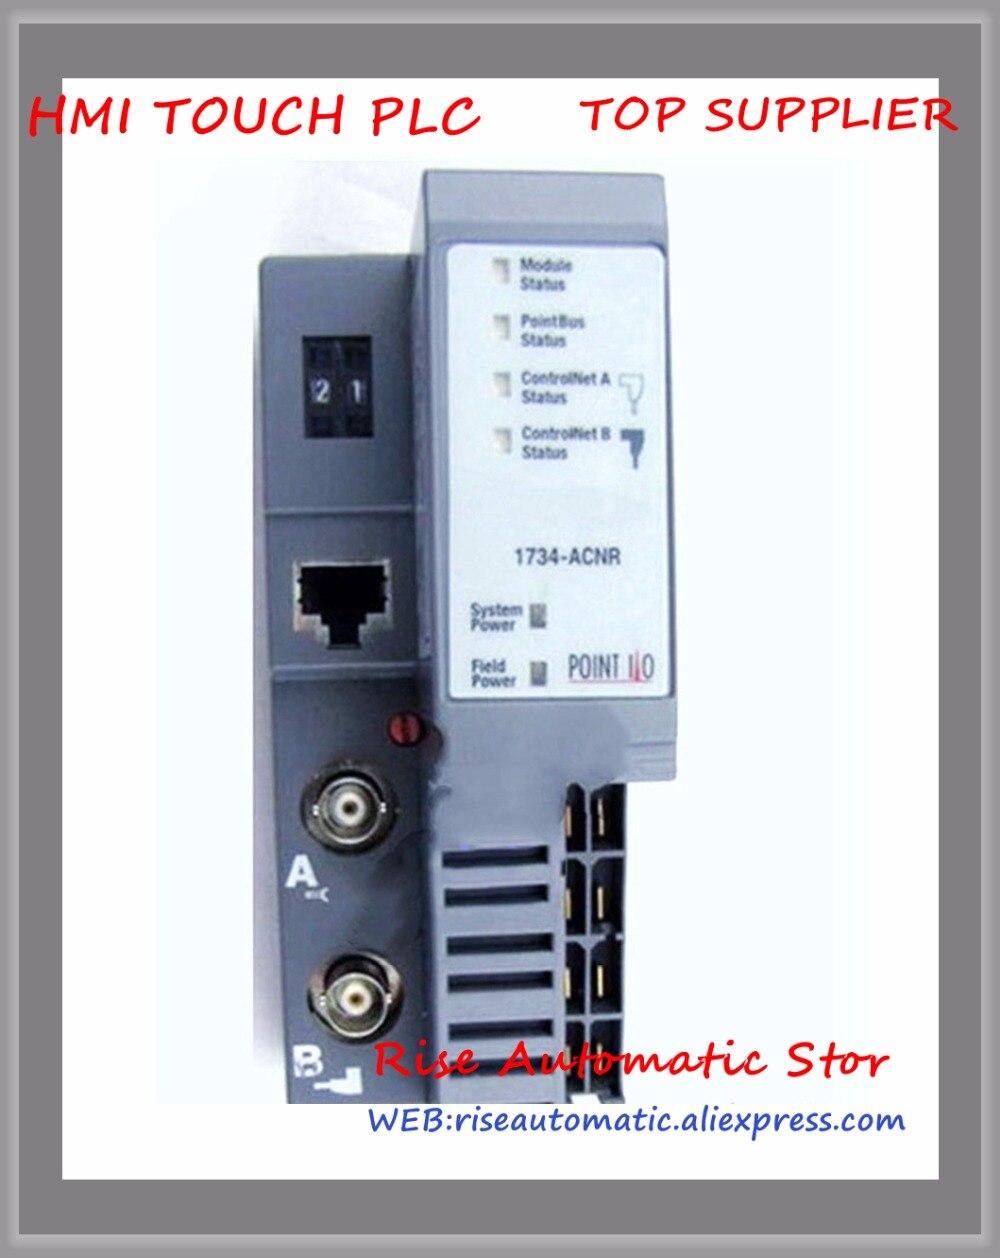 1734-ACNR PLC 10-28.8VDC 63 PUNTI I/O moduli ControlNet Nuovo Originale1734-ACNR PLC 10-28.8VDC 63 PUNTI I/O moduli ControlNet Nuovo Originale